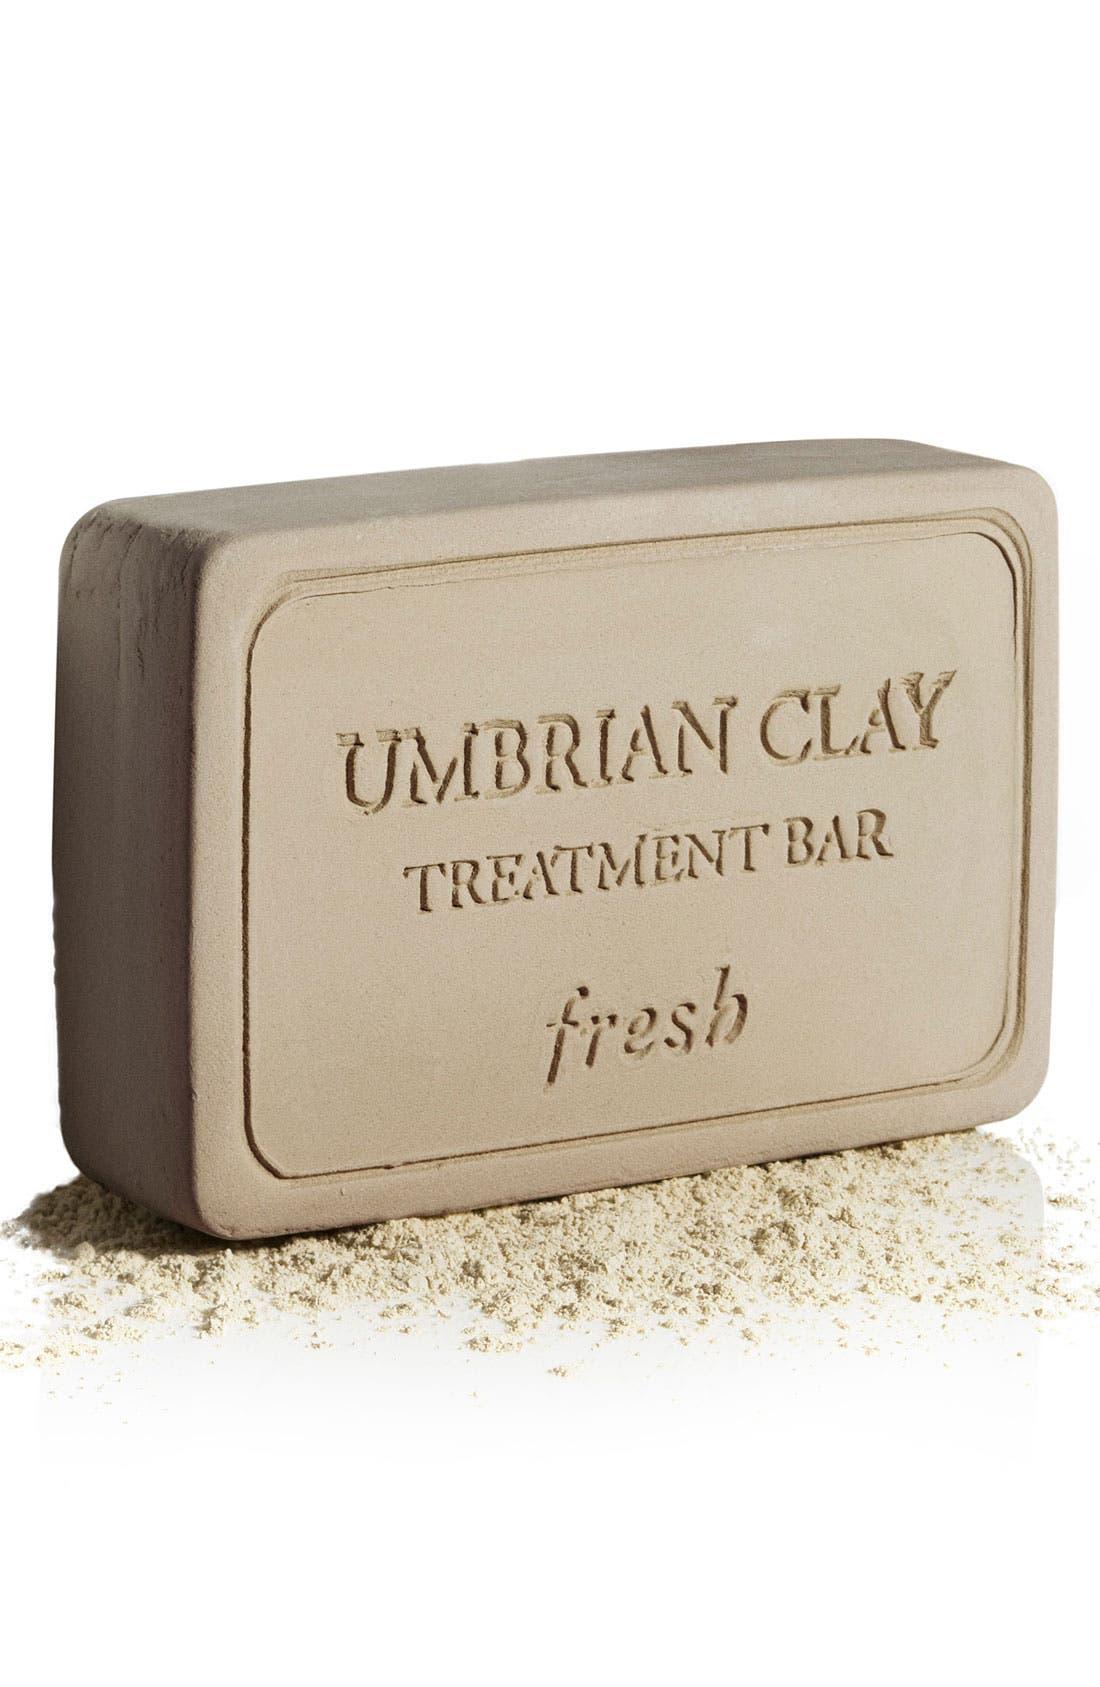 Umbrian Clay Treatment Bar,                             Main thumbnail 1, color,                             NO COLOR